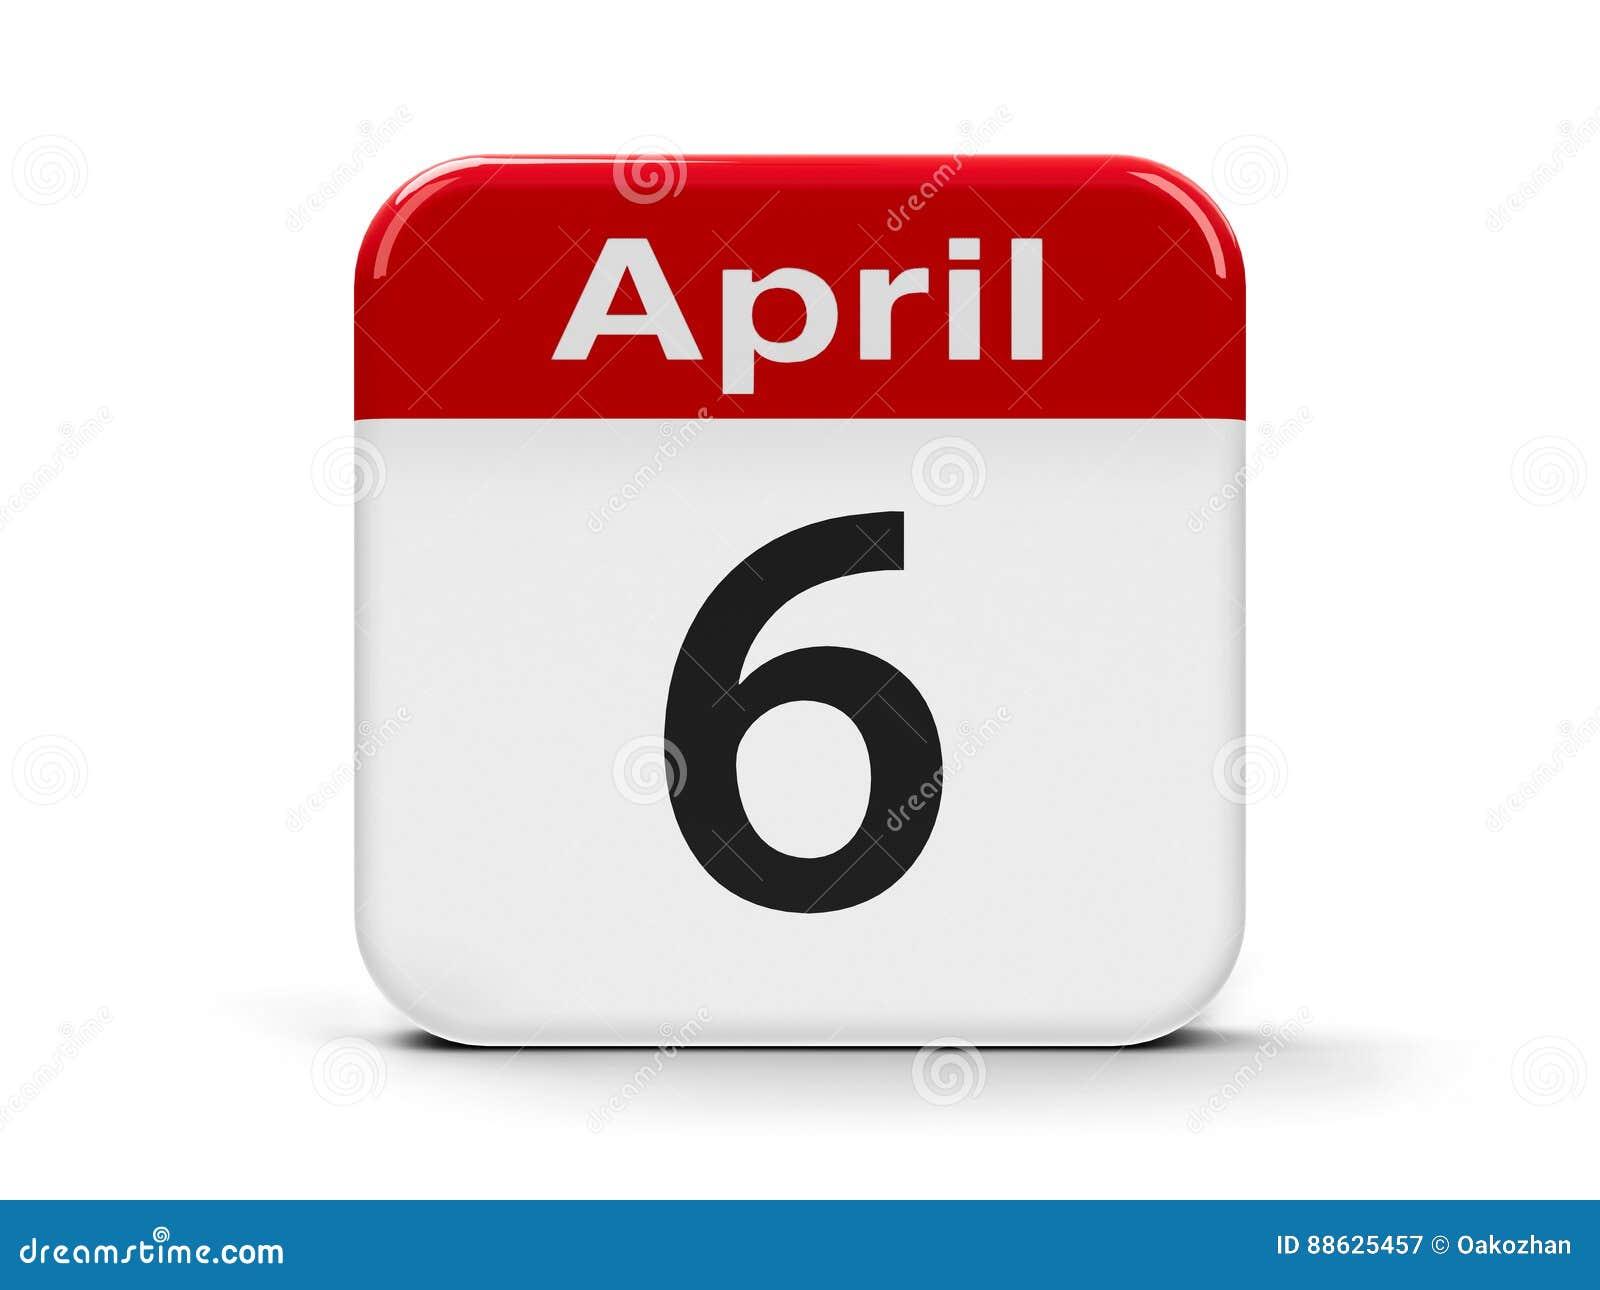 6. April